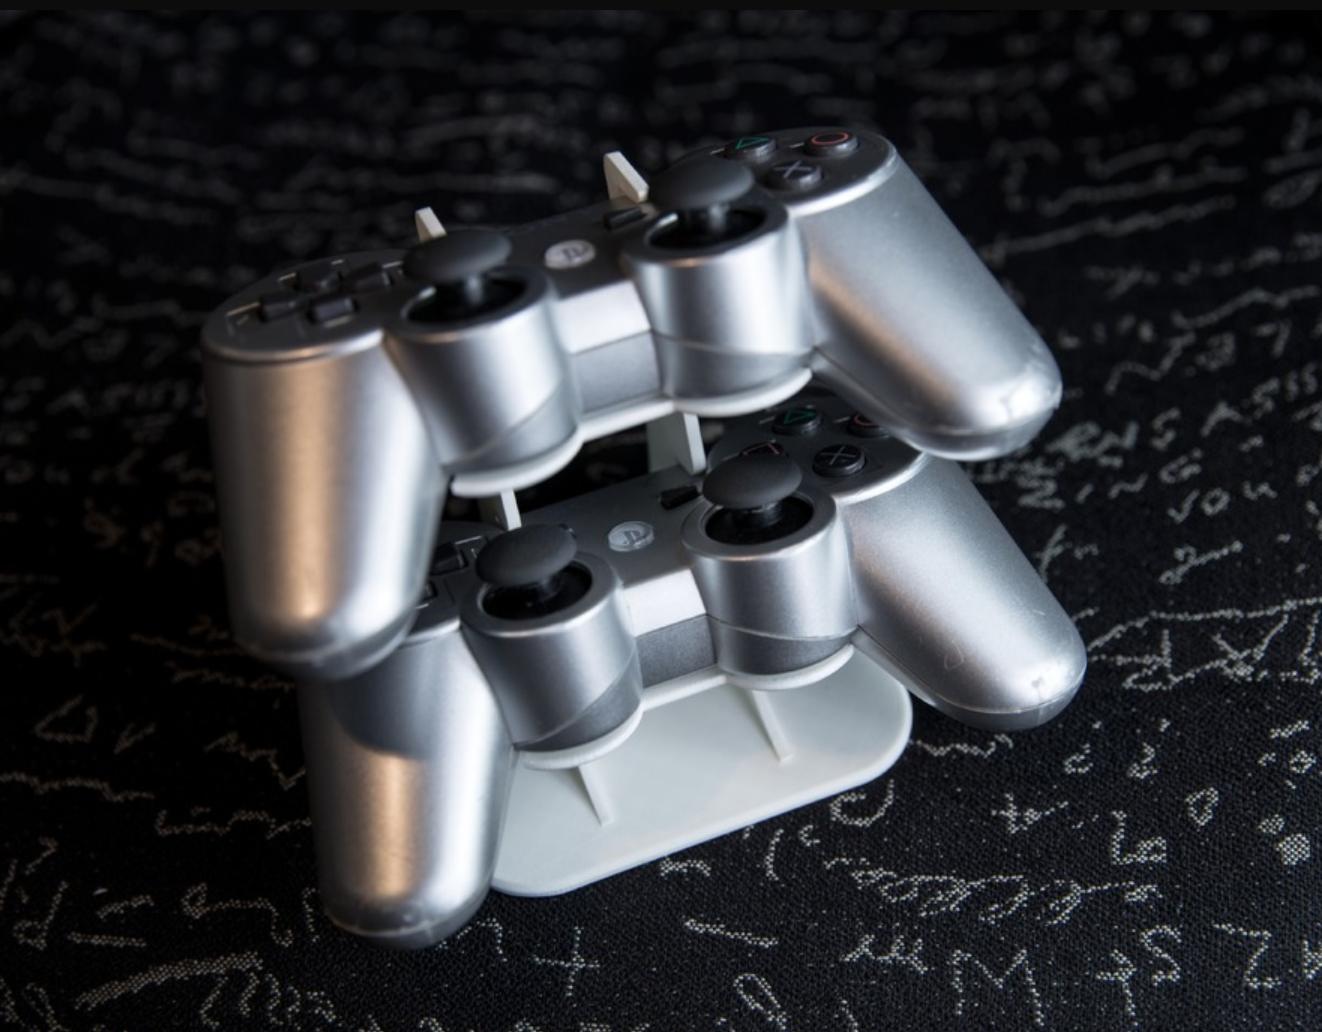 Capture d'écran 2018-01-05 à 12.41.32.png Download free STL file PS3 Controller Holder • Model to 3D print, Greystone